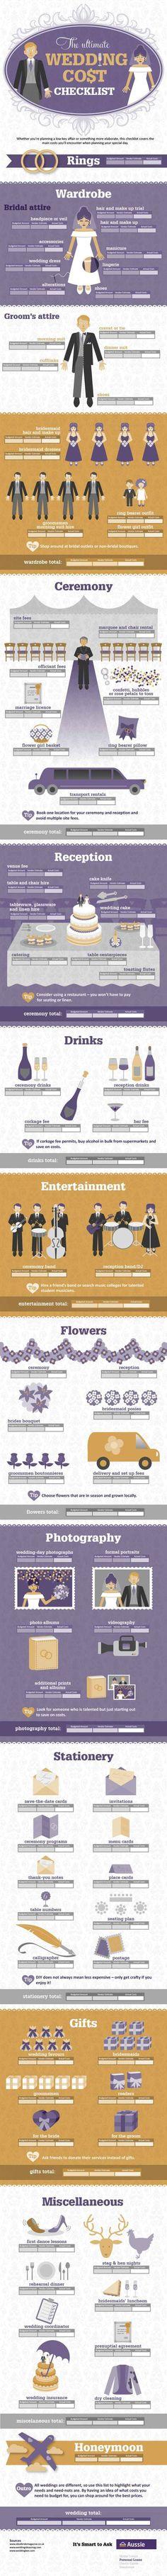 Ultimate Wedding Cost Checklist.